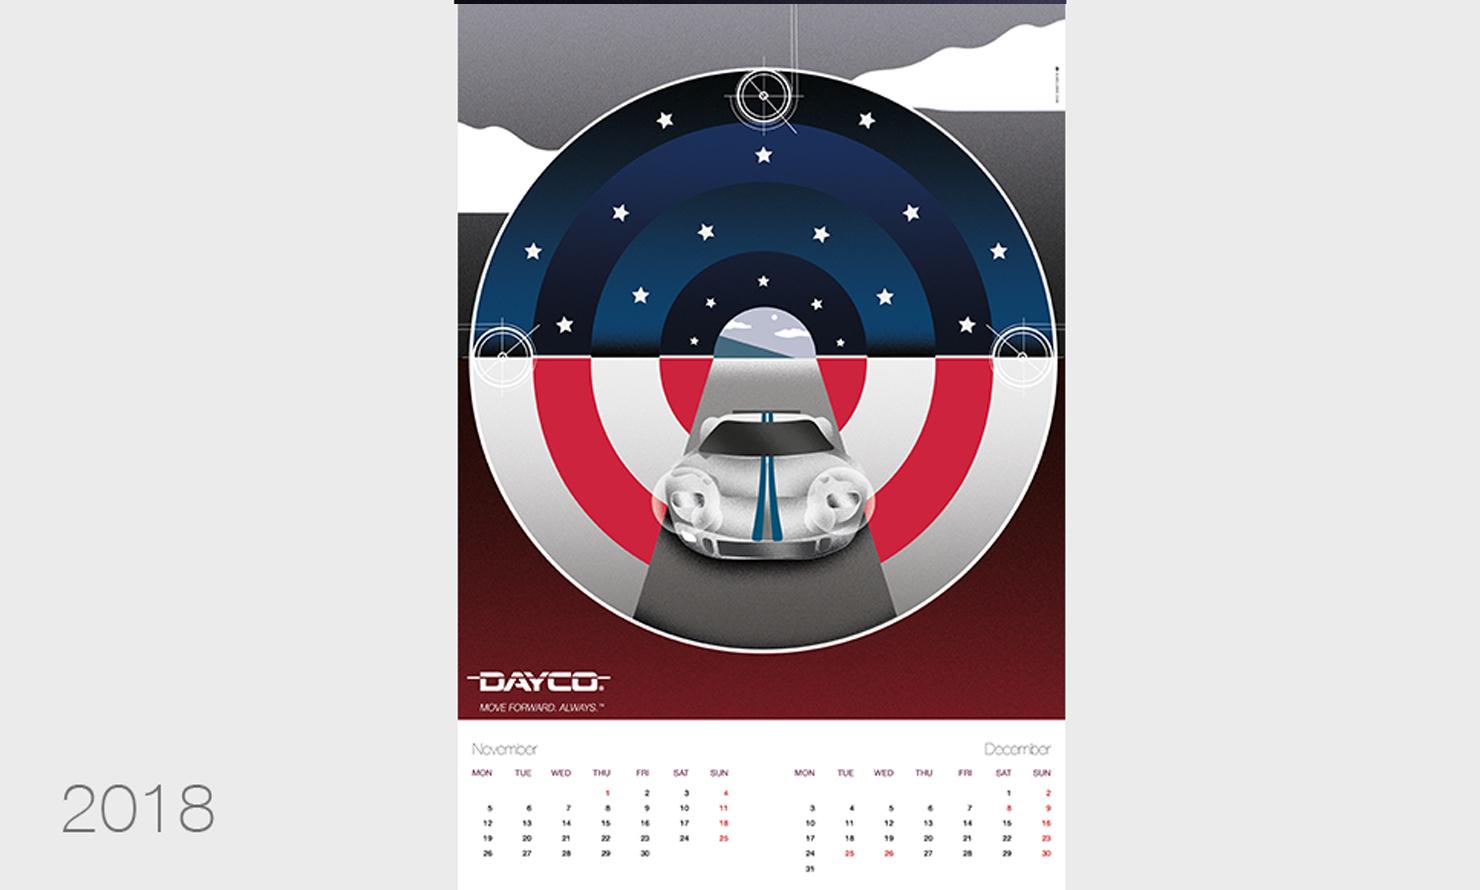 https://kubelibre.com/uploads/Slider-work-tutti-clienti/dayco-calendario-2018-6.jpg